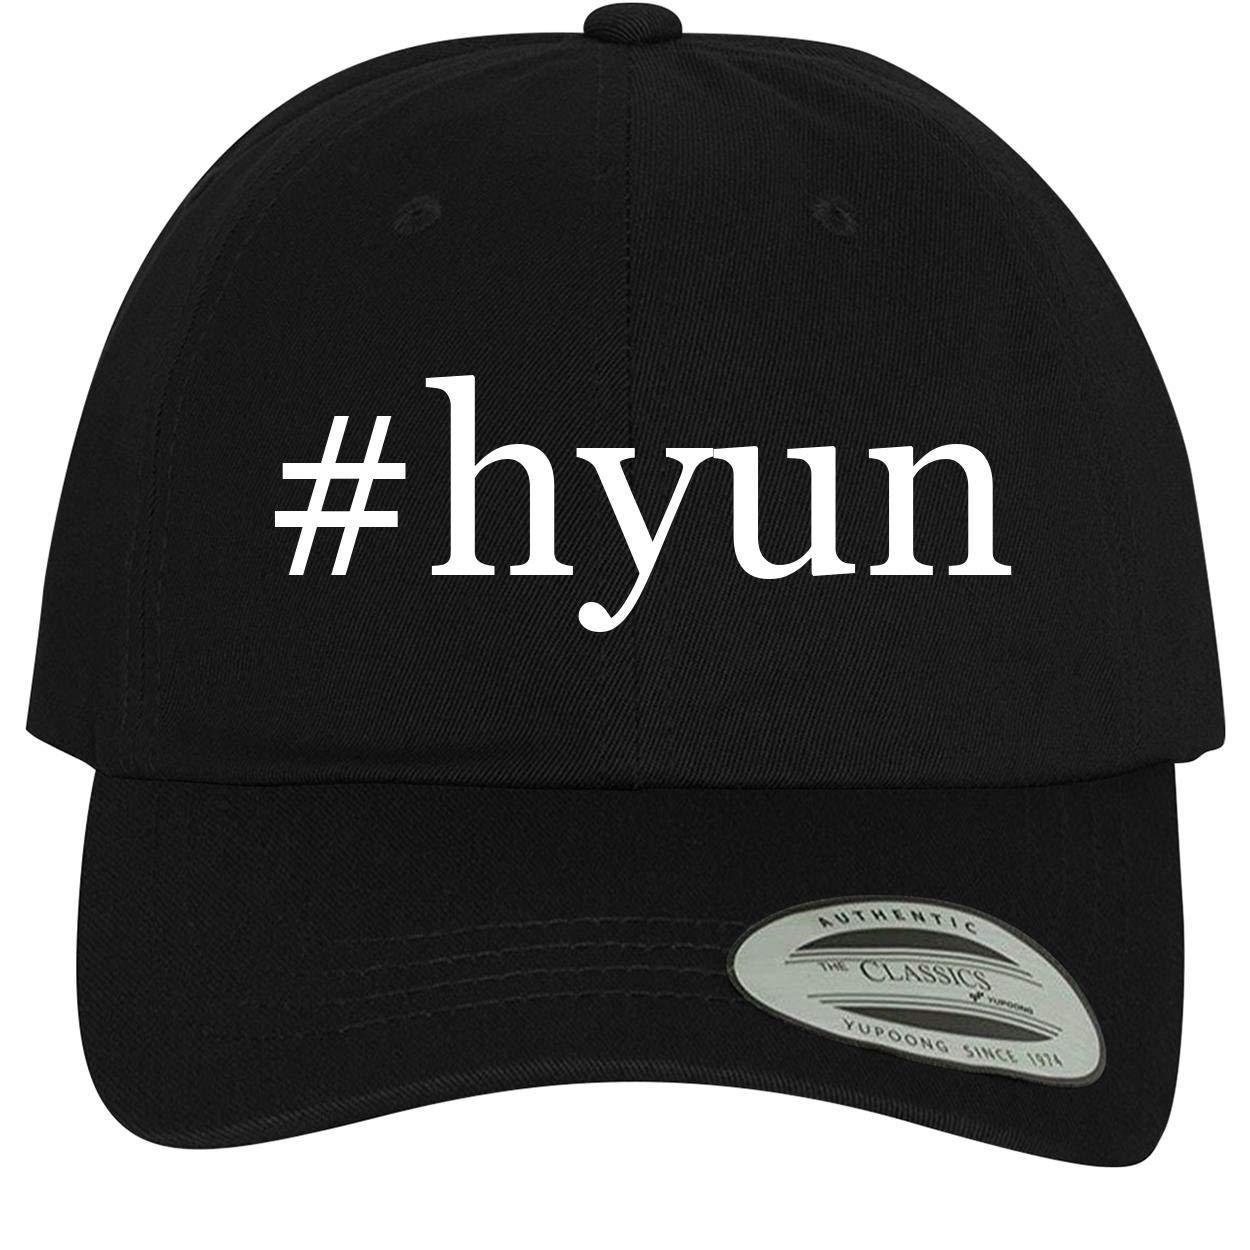 Comfortable Dad Hat Baseball Cap BH Cool Designs #Hyun